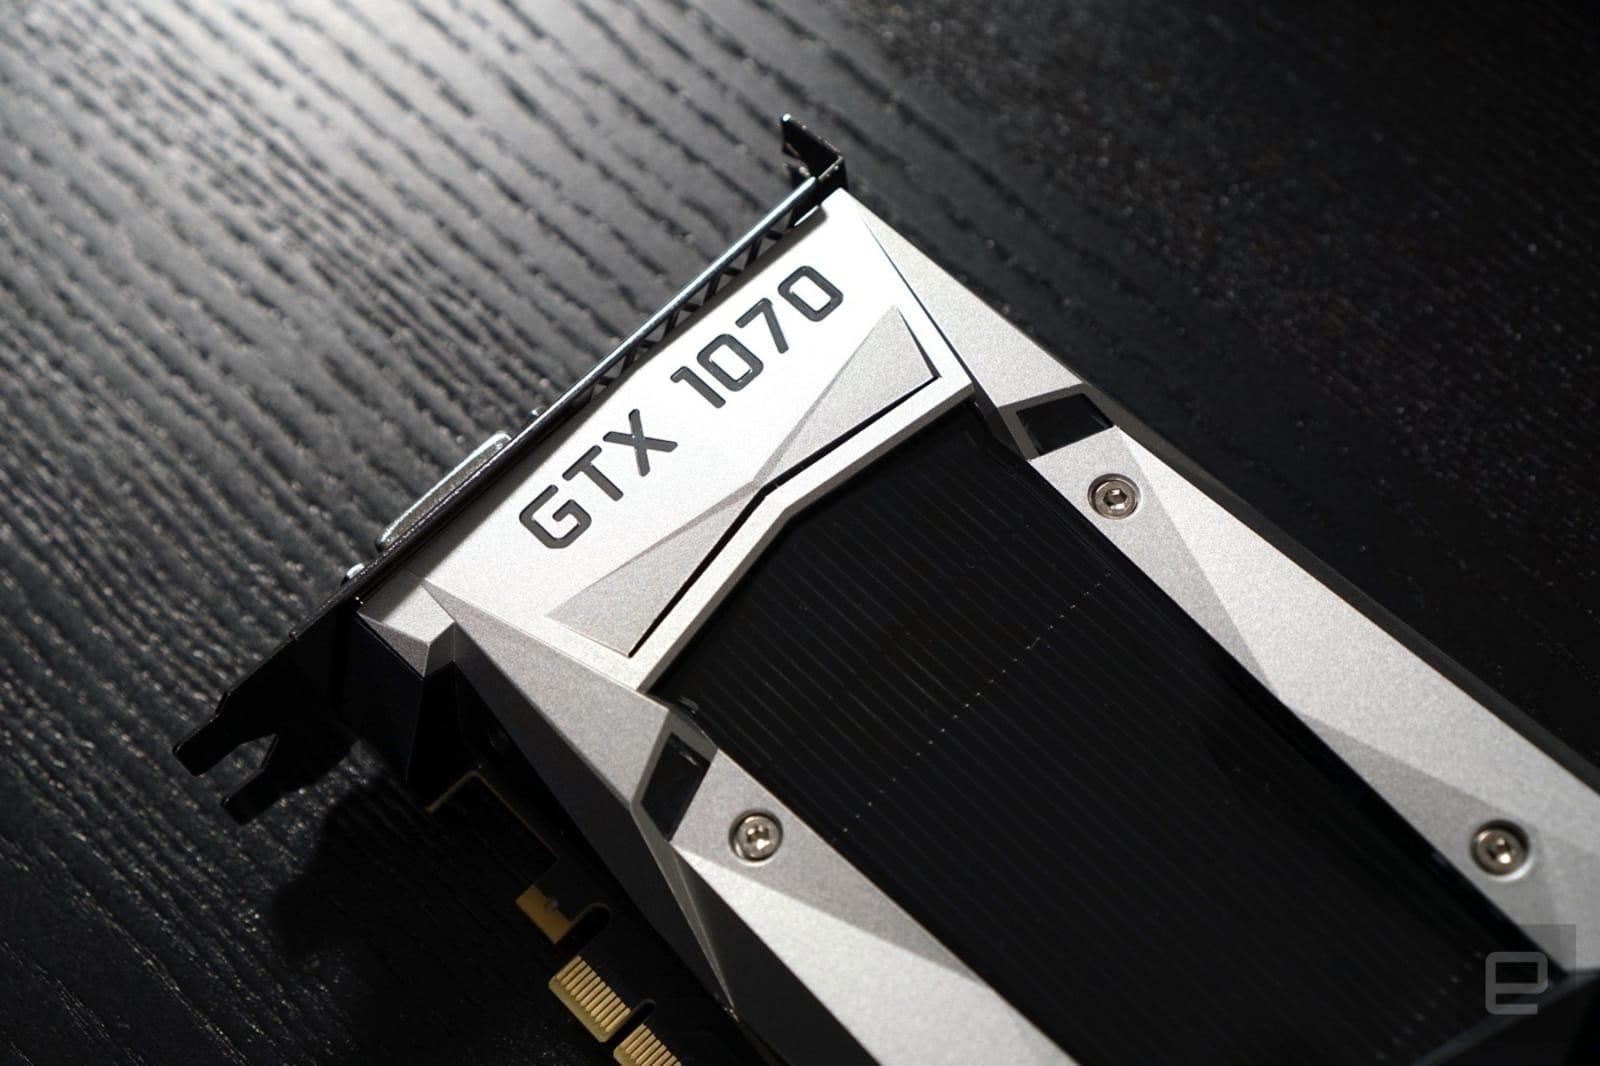 NVIDIA's GTX 1070 is a mid-range GPU that feels high-end